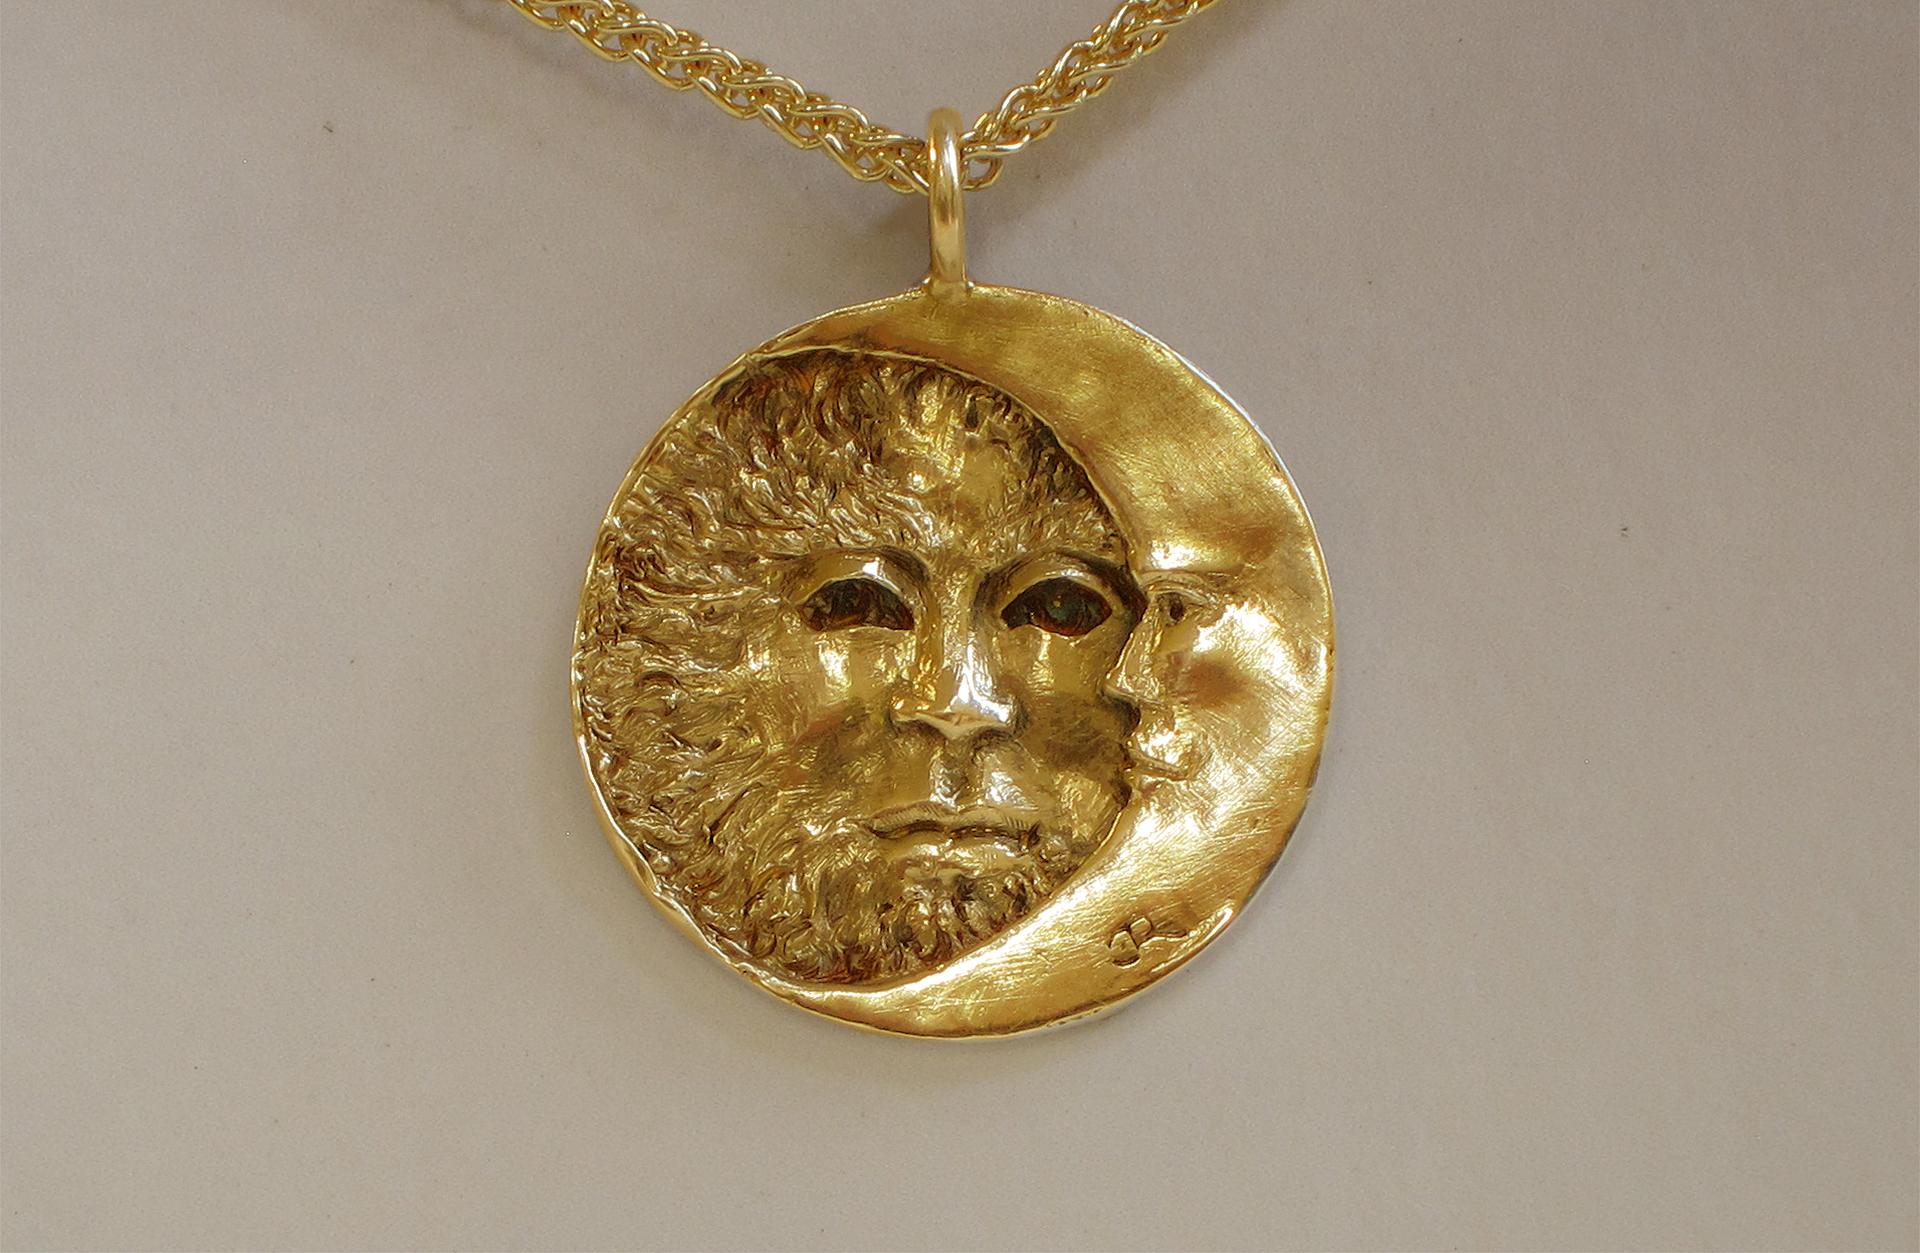 Douglas Randall Sun and Moon Pendent